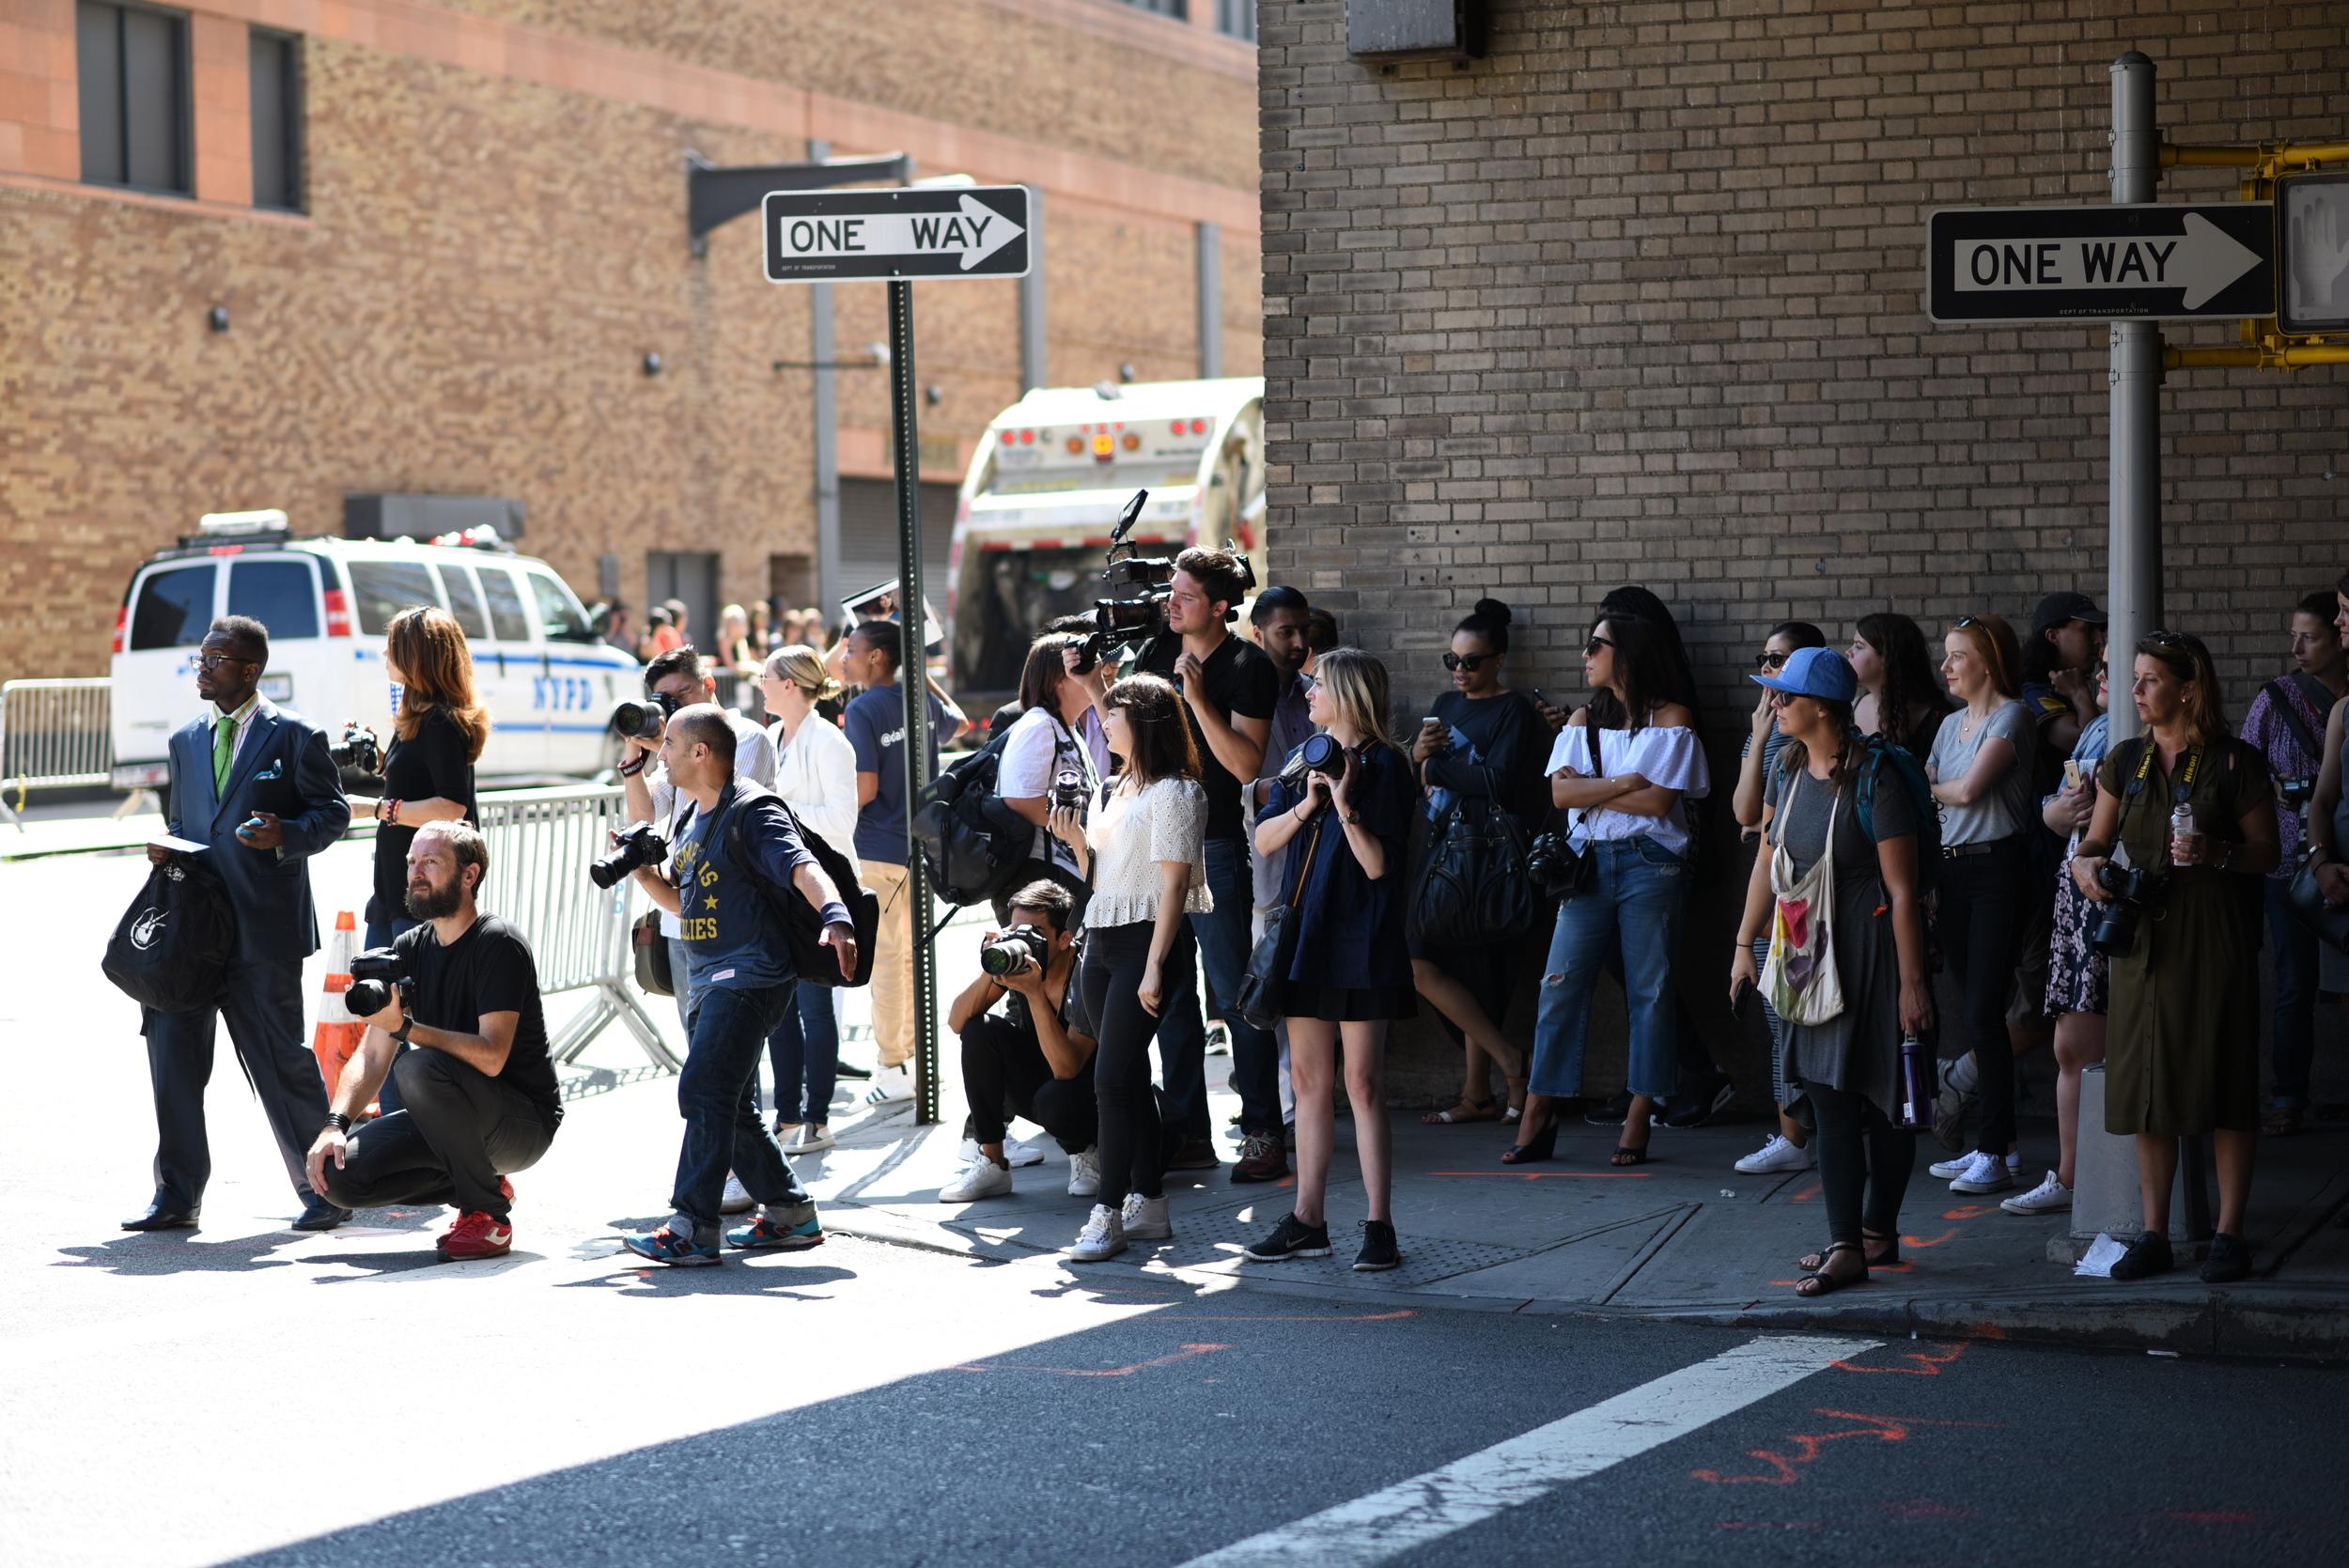 photographers-at-new-york-fashion-week.jpg